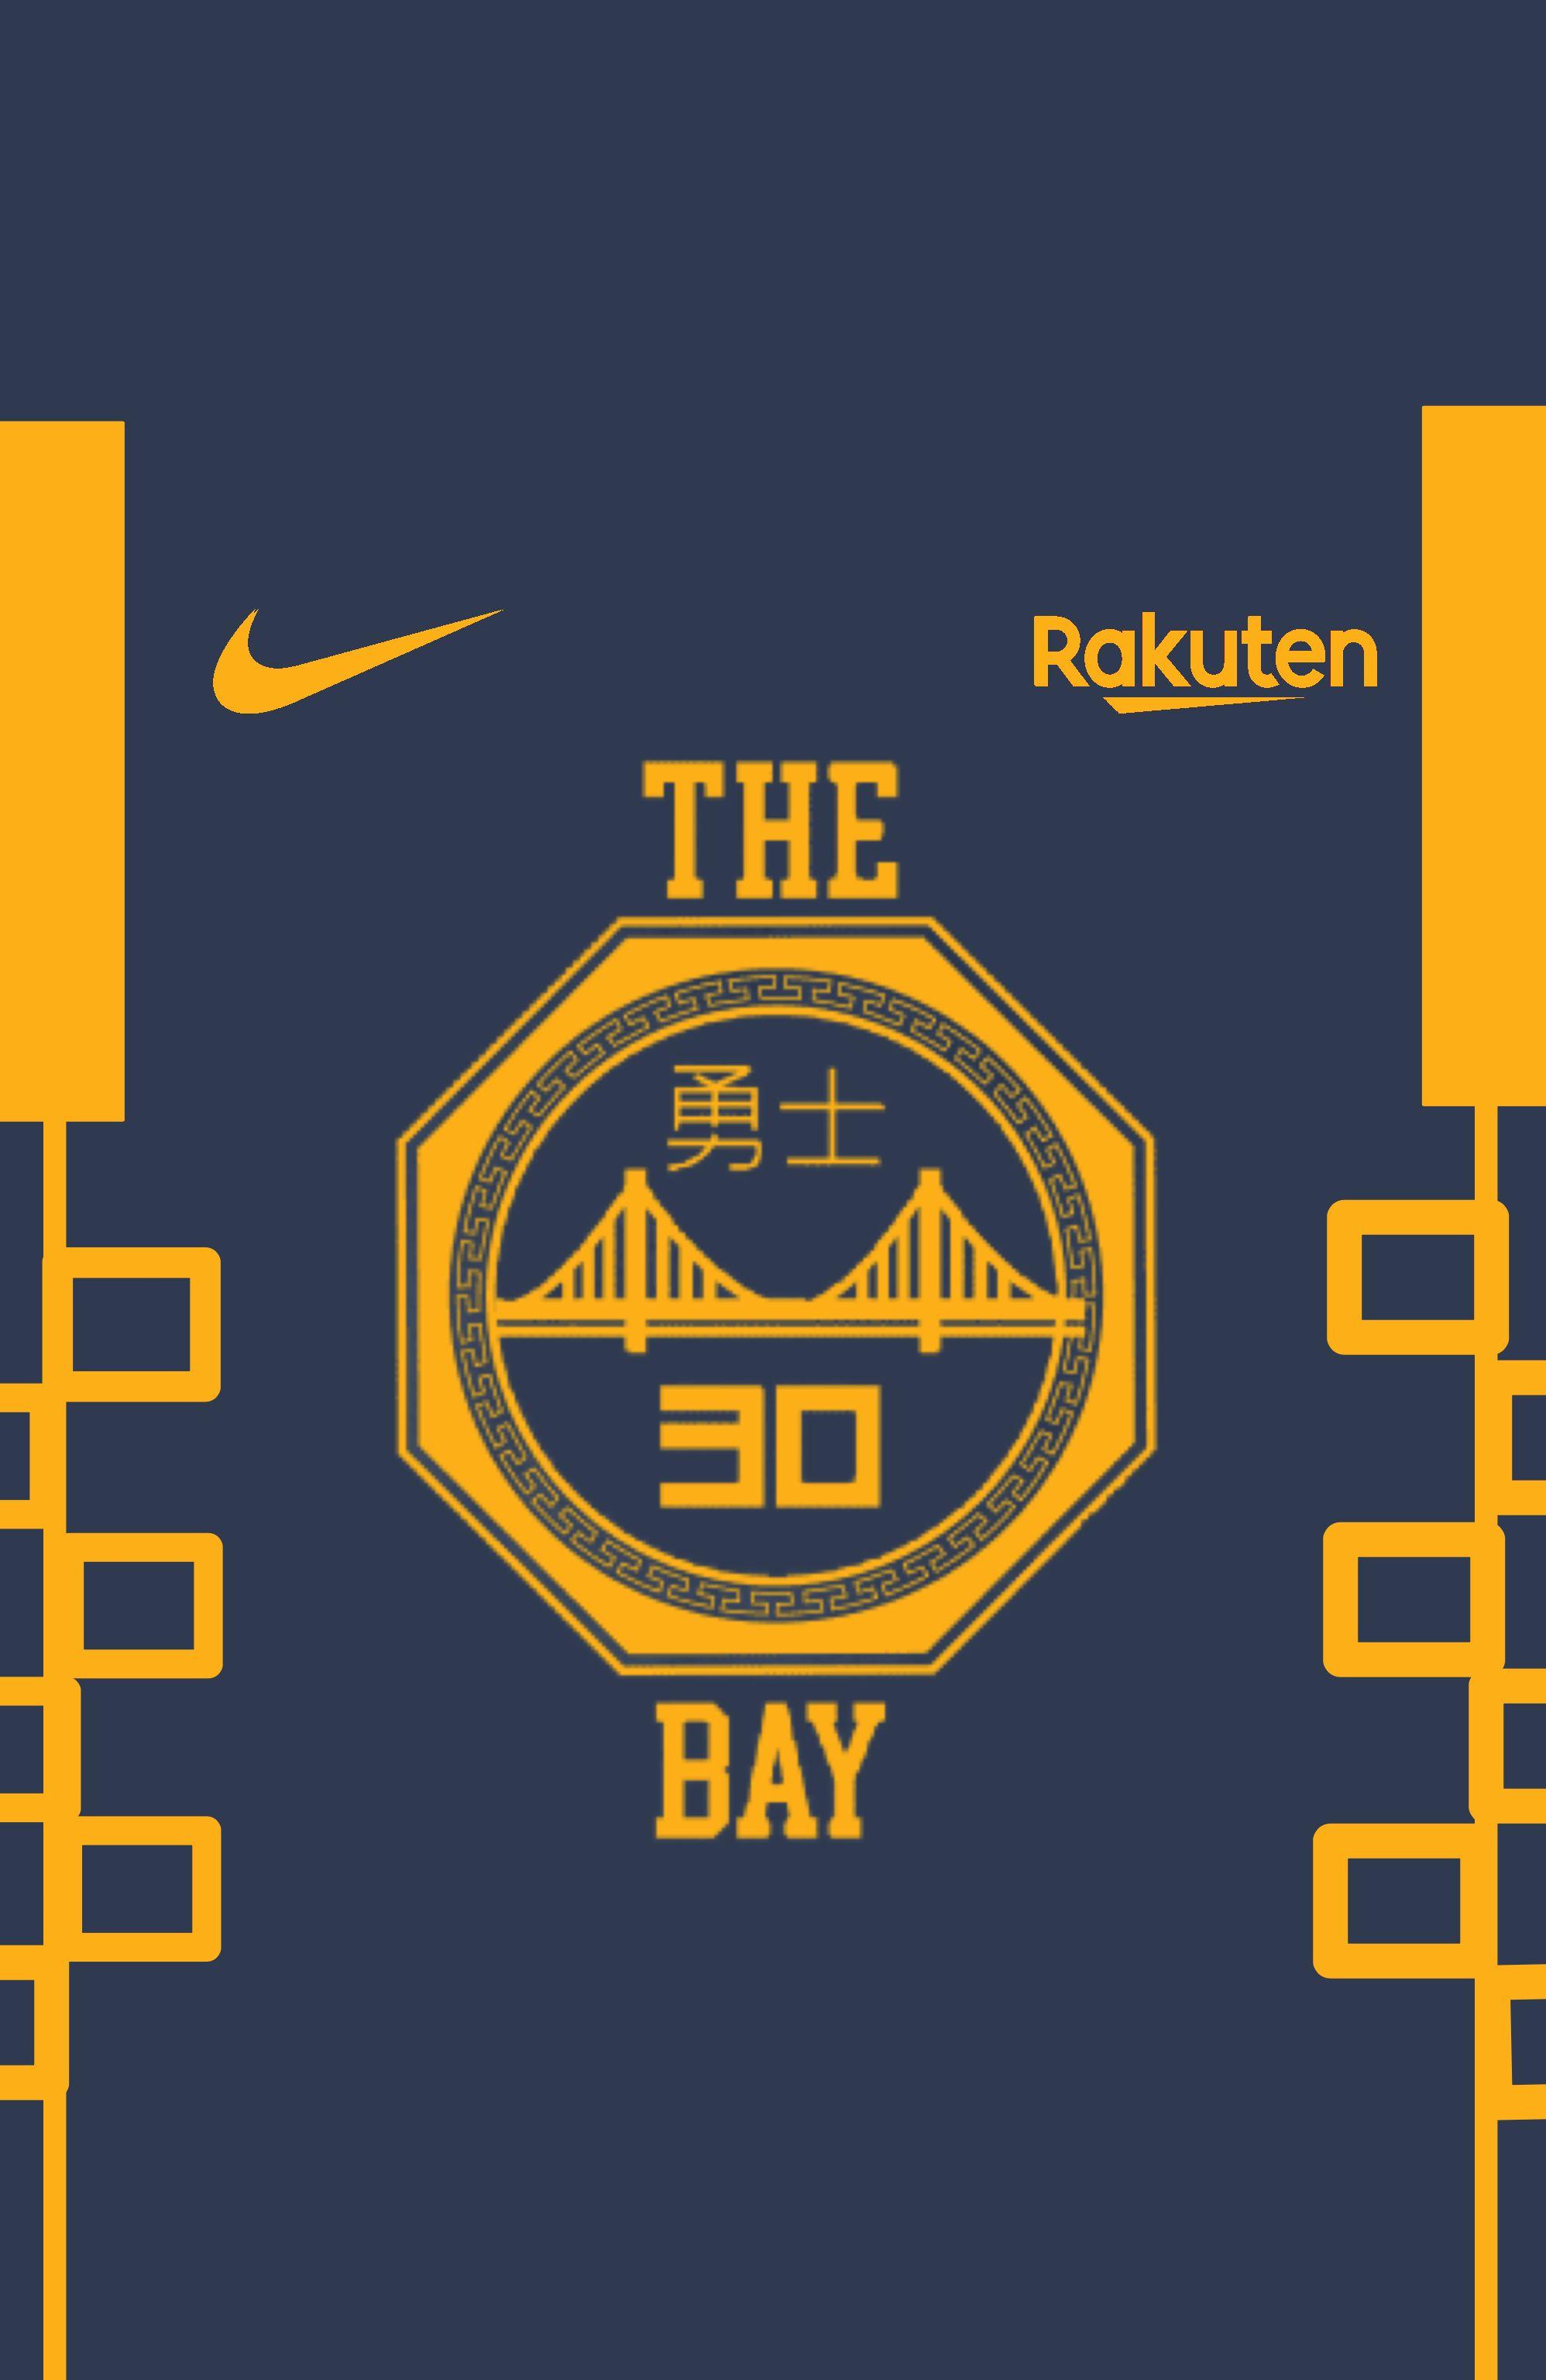 The Bay Jersey Wallpaper Golden State Warriors Golden State Warriors Wallpaper Golden State Warriors Golden State Warriors Basketball